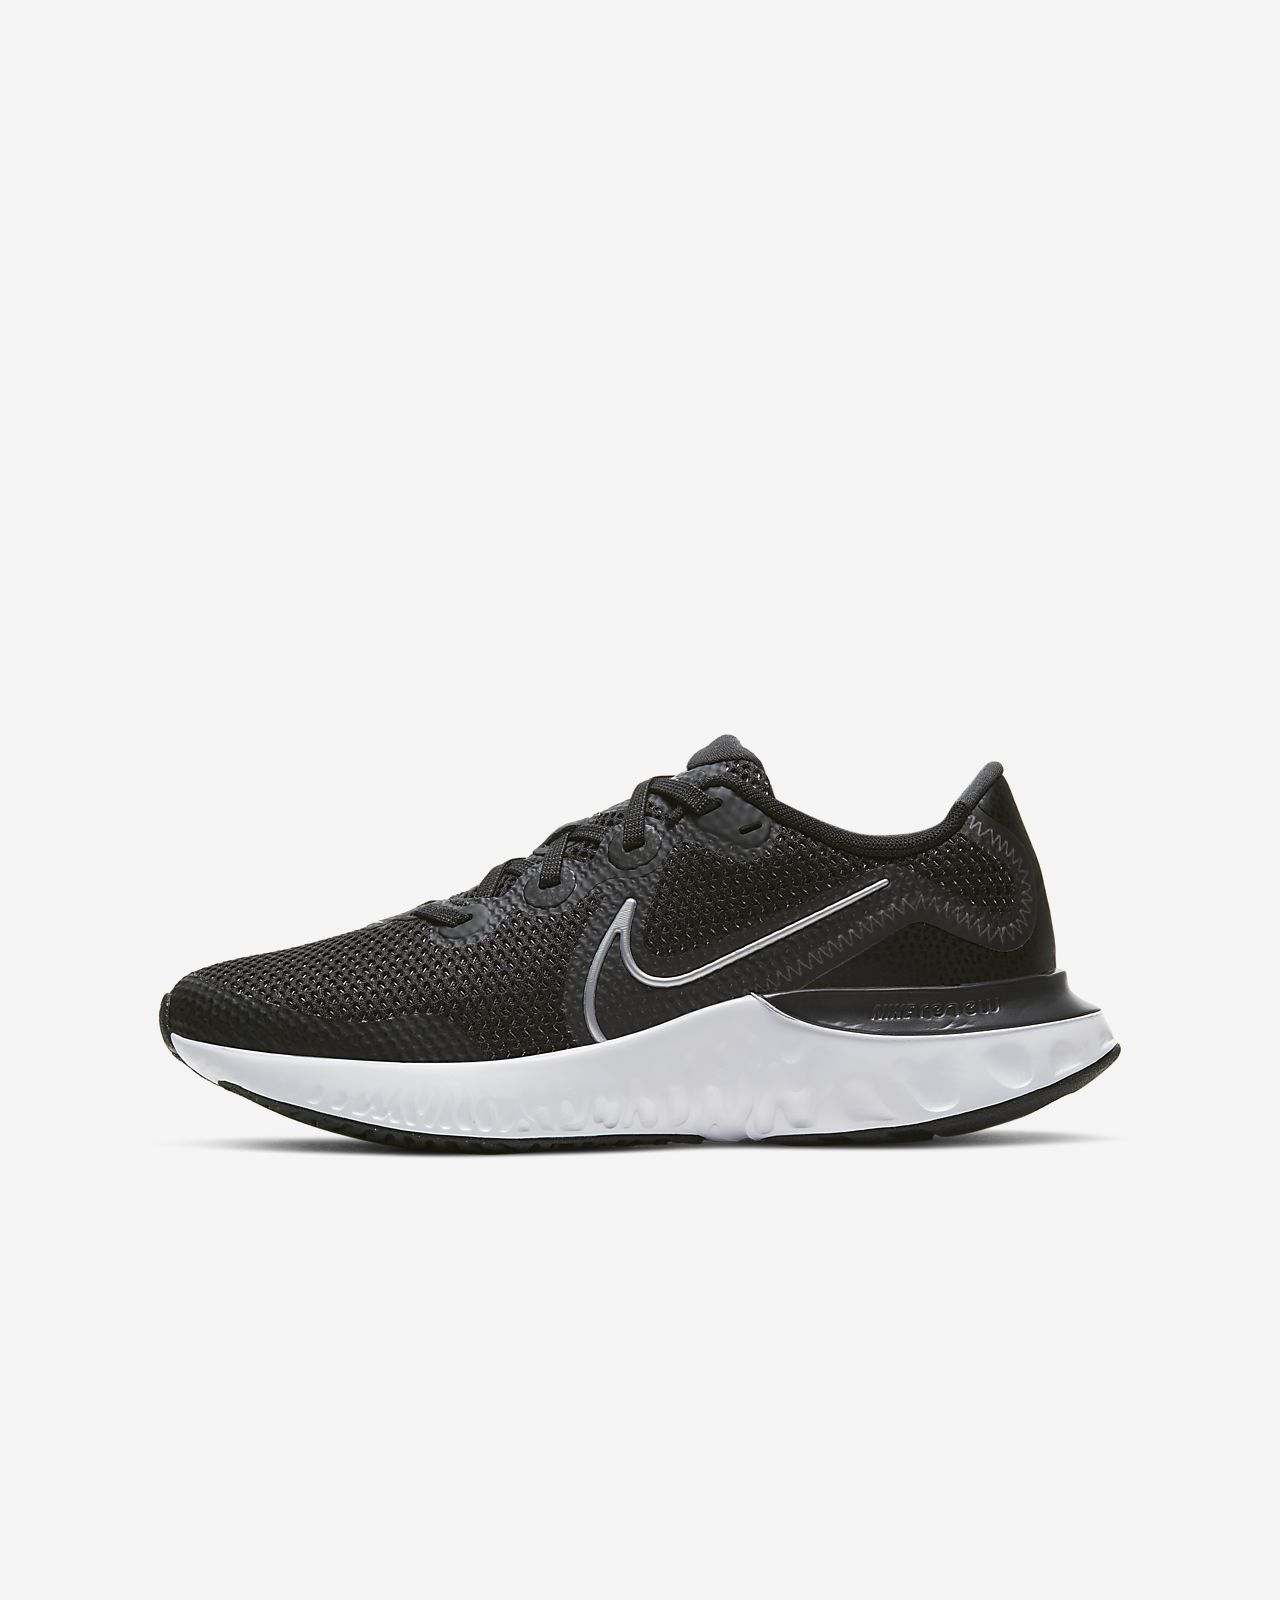 Sapatilhas de running Nike Renew Run Júnior